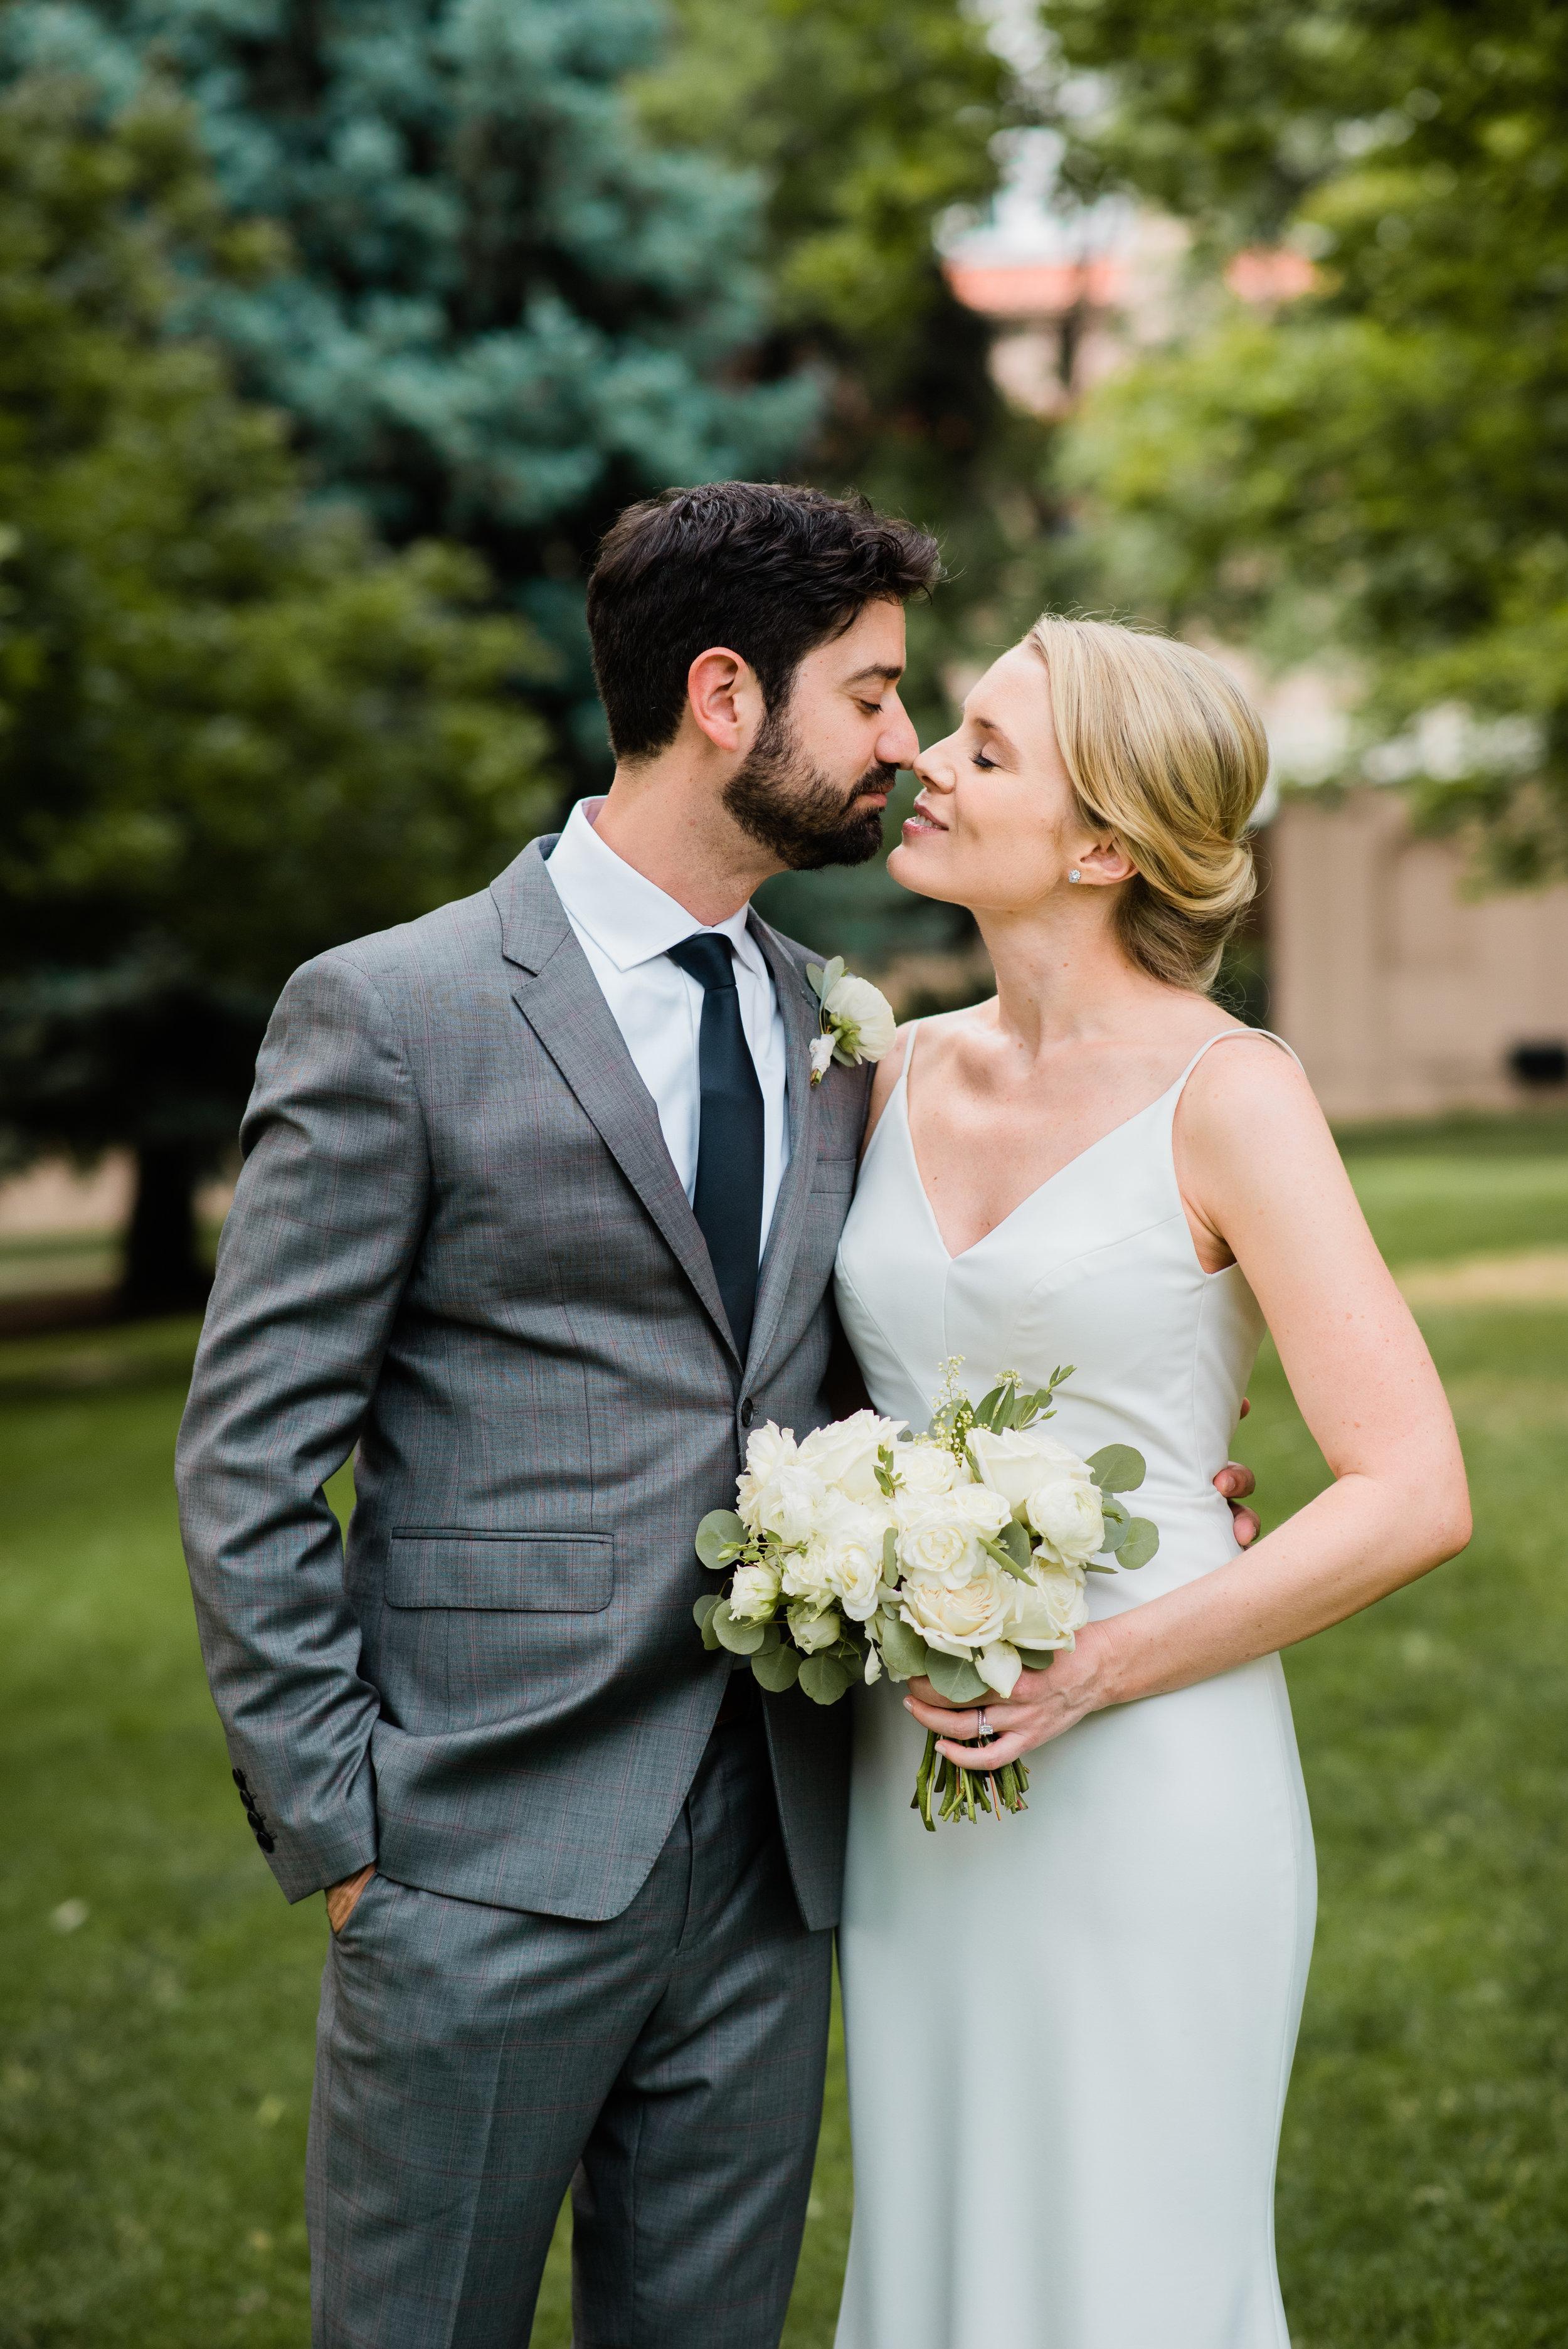 Heather | Grant Humphreys Mansion | July 2018 | Heather Creates Photography